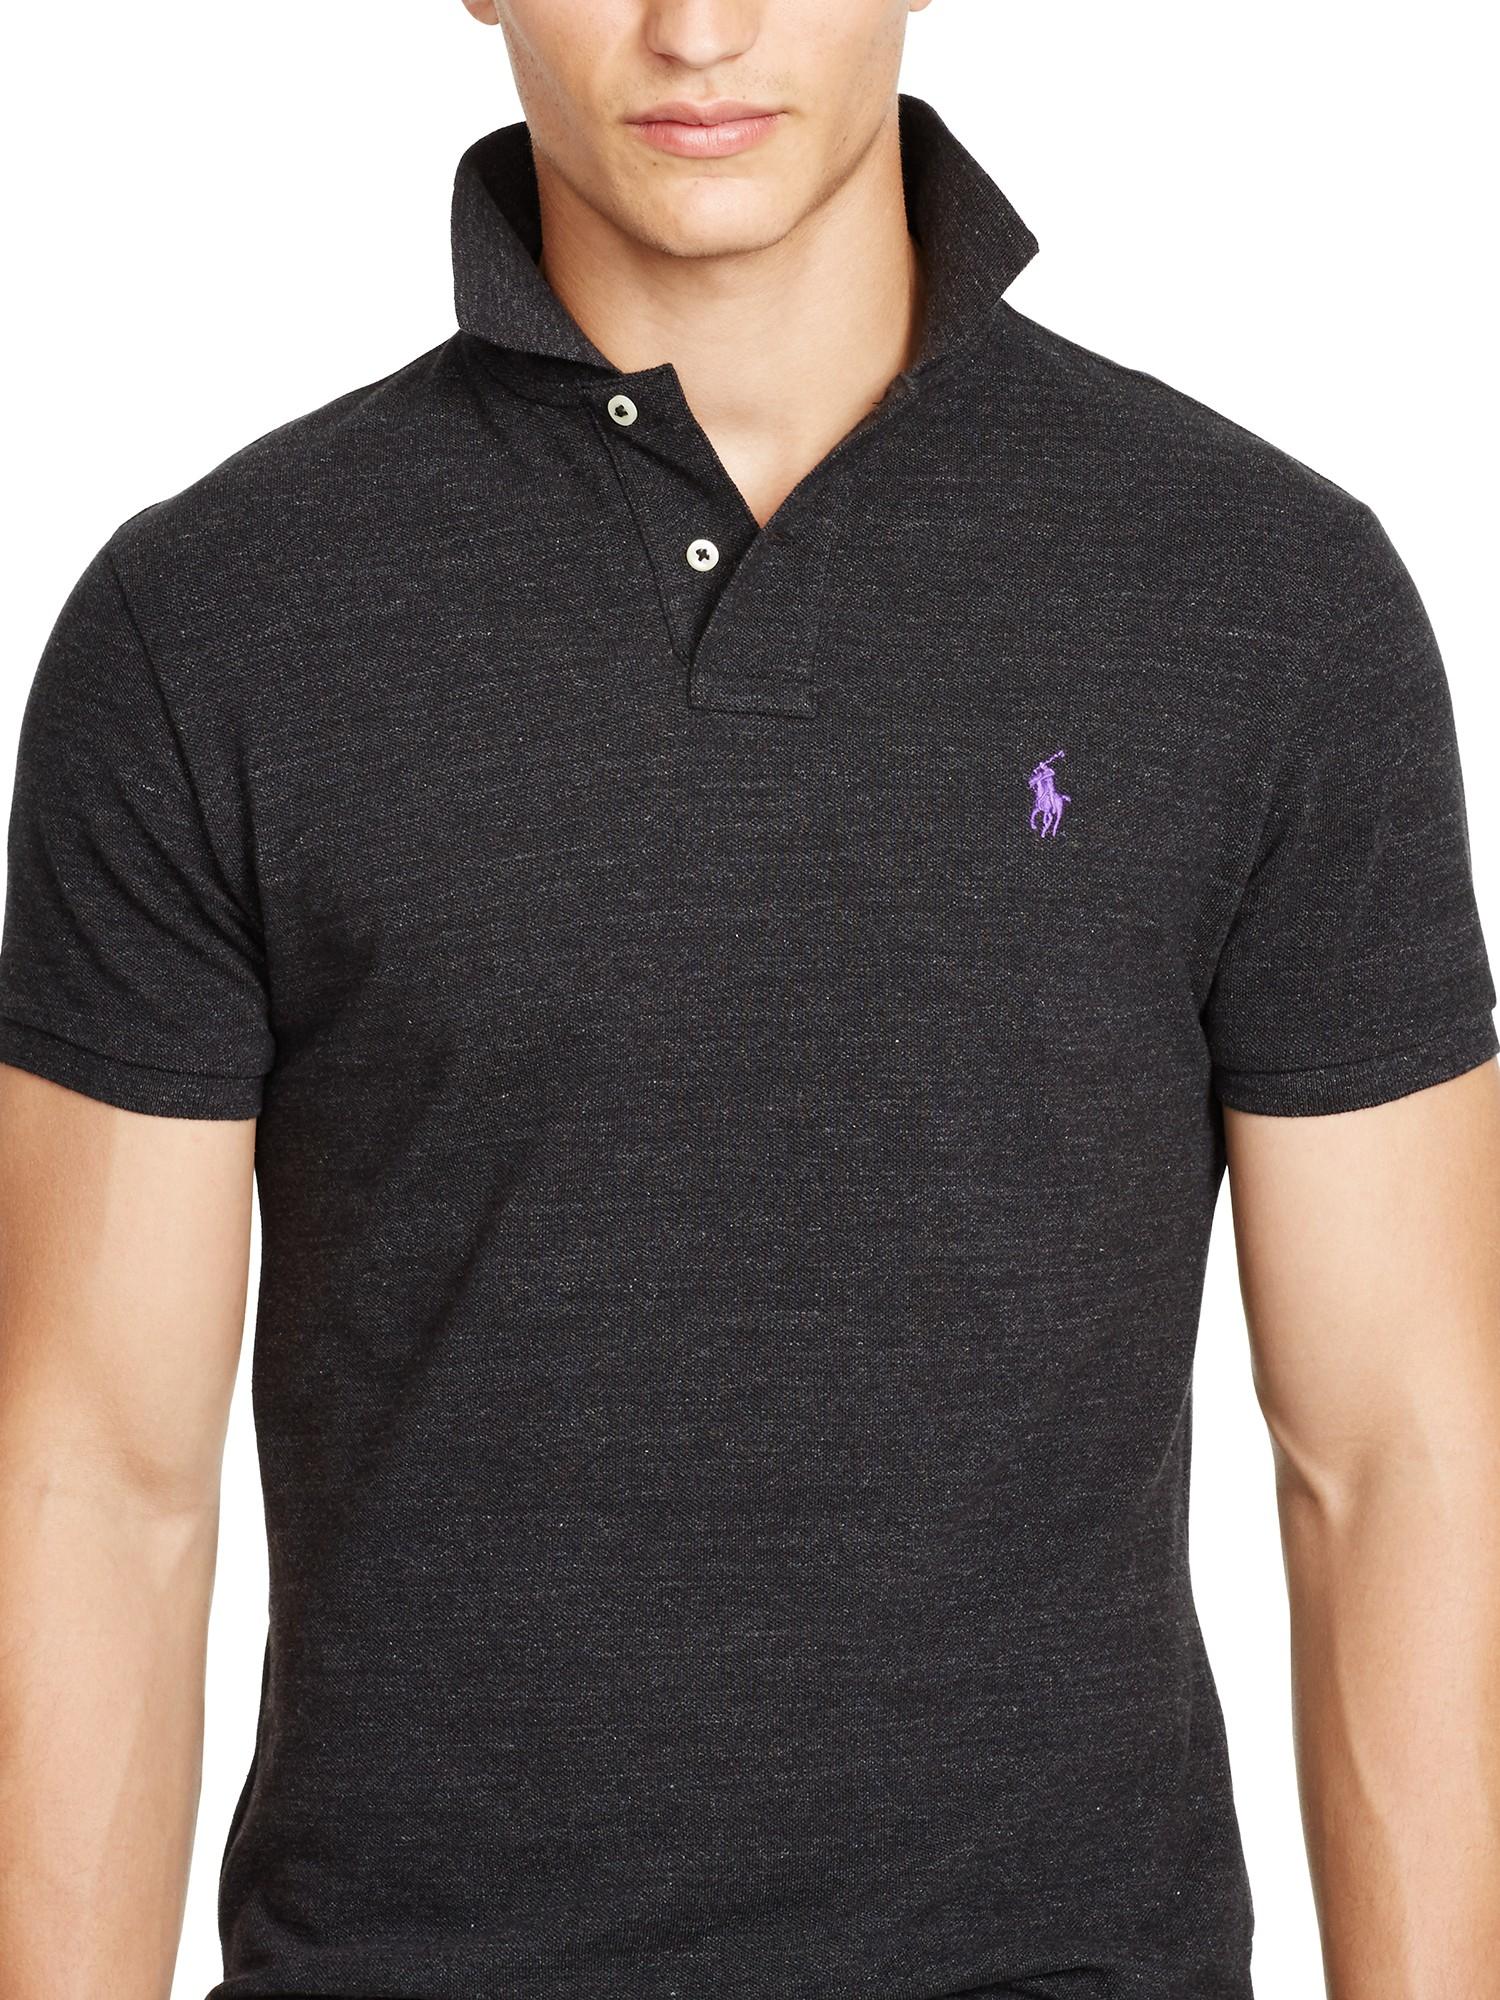 302f098ae15c3 Polo Ralph Lauren Custom Fit Polo Shirt in Black for Men - Lyst